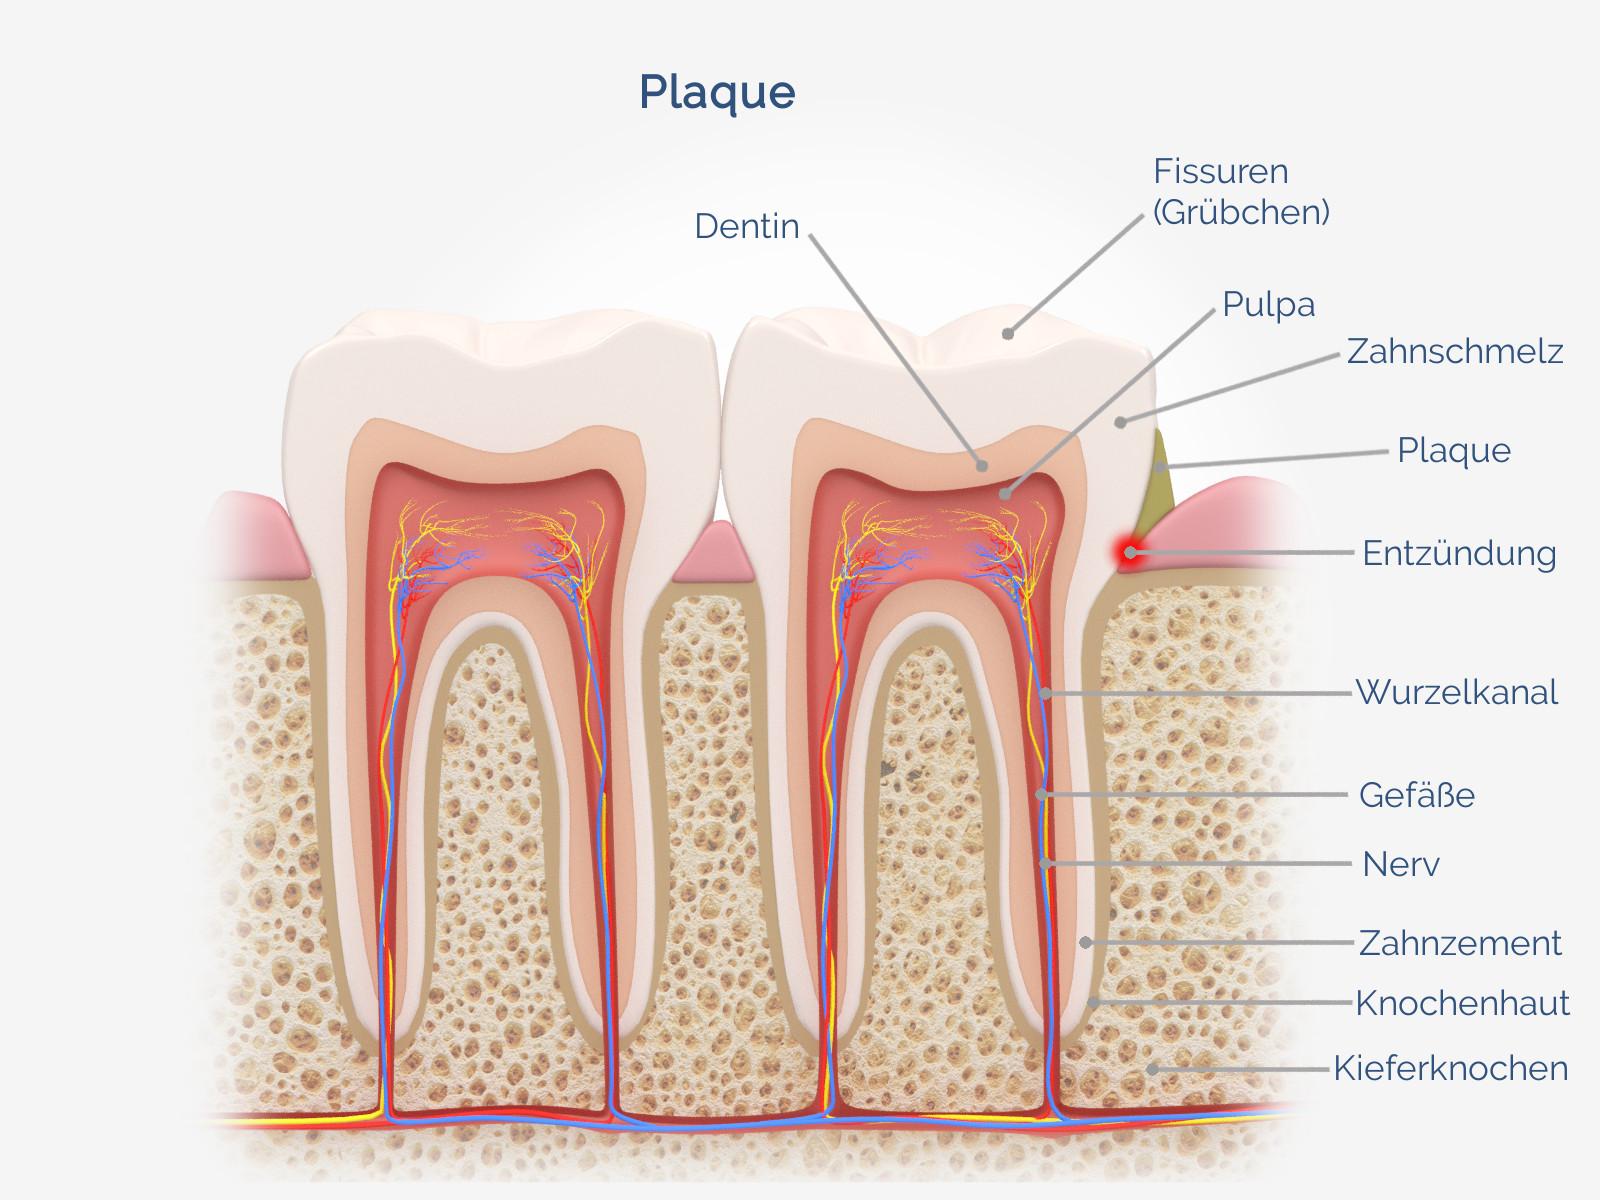 Plaque (Zahnbelag)